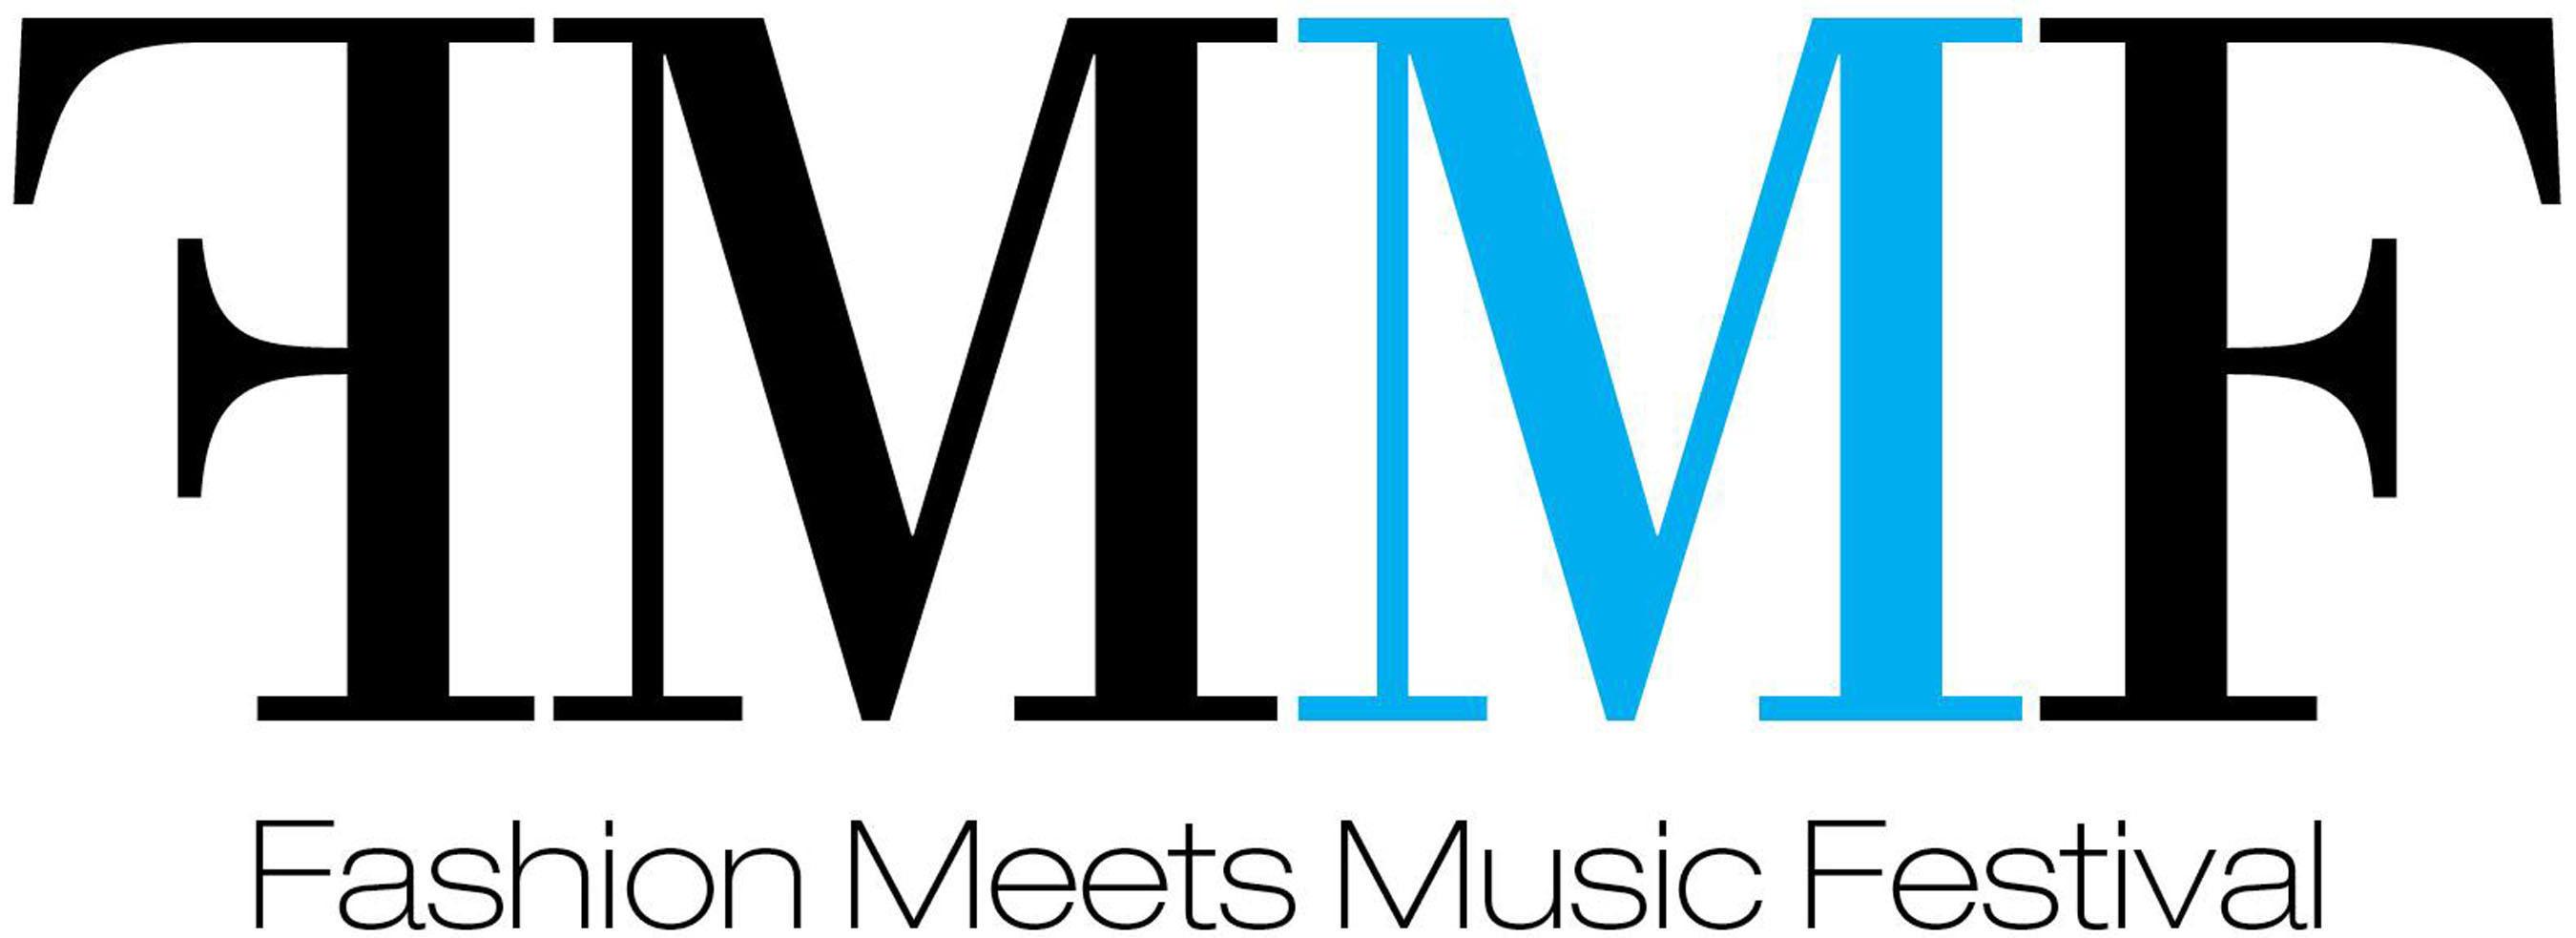 FMMF will assemble a premier line-up of emerging artists. (PRNewsFoto/Fashion Meets Music Festival) (PRNewsFoto/FASHION MEETS MUSIC FESTIVAL)